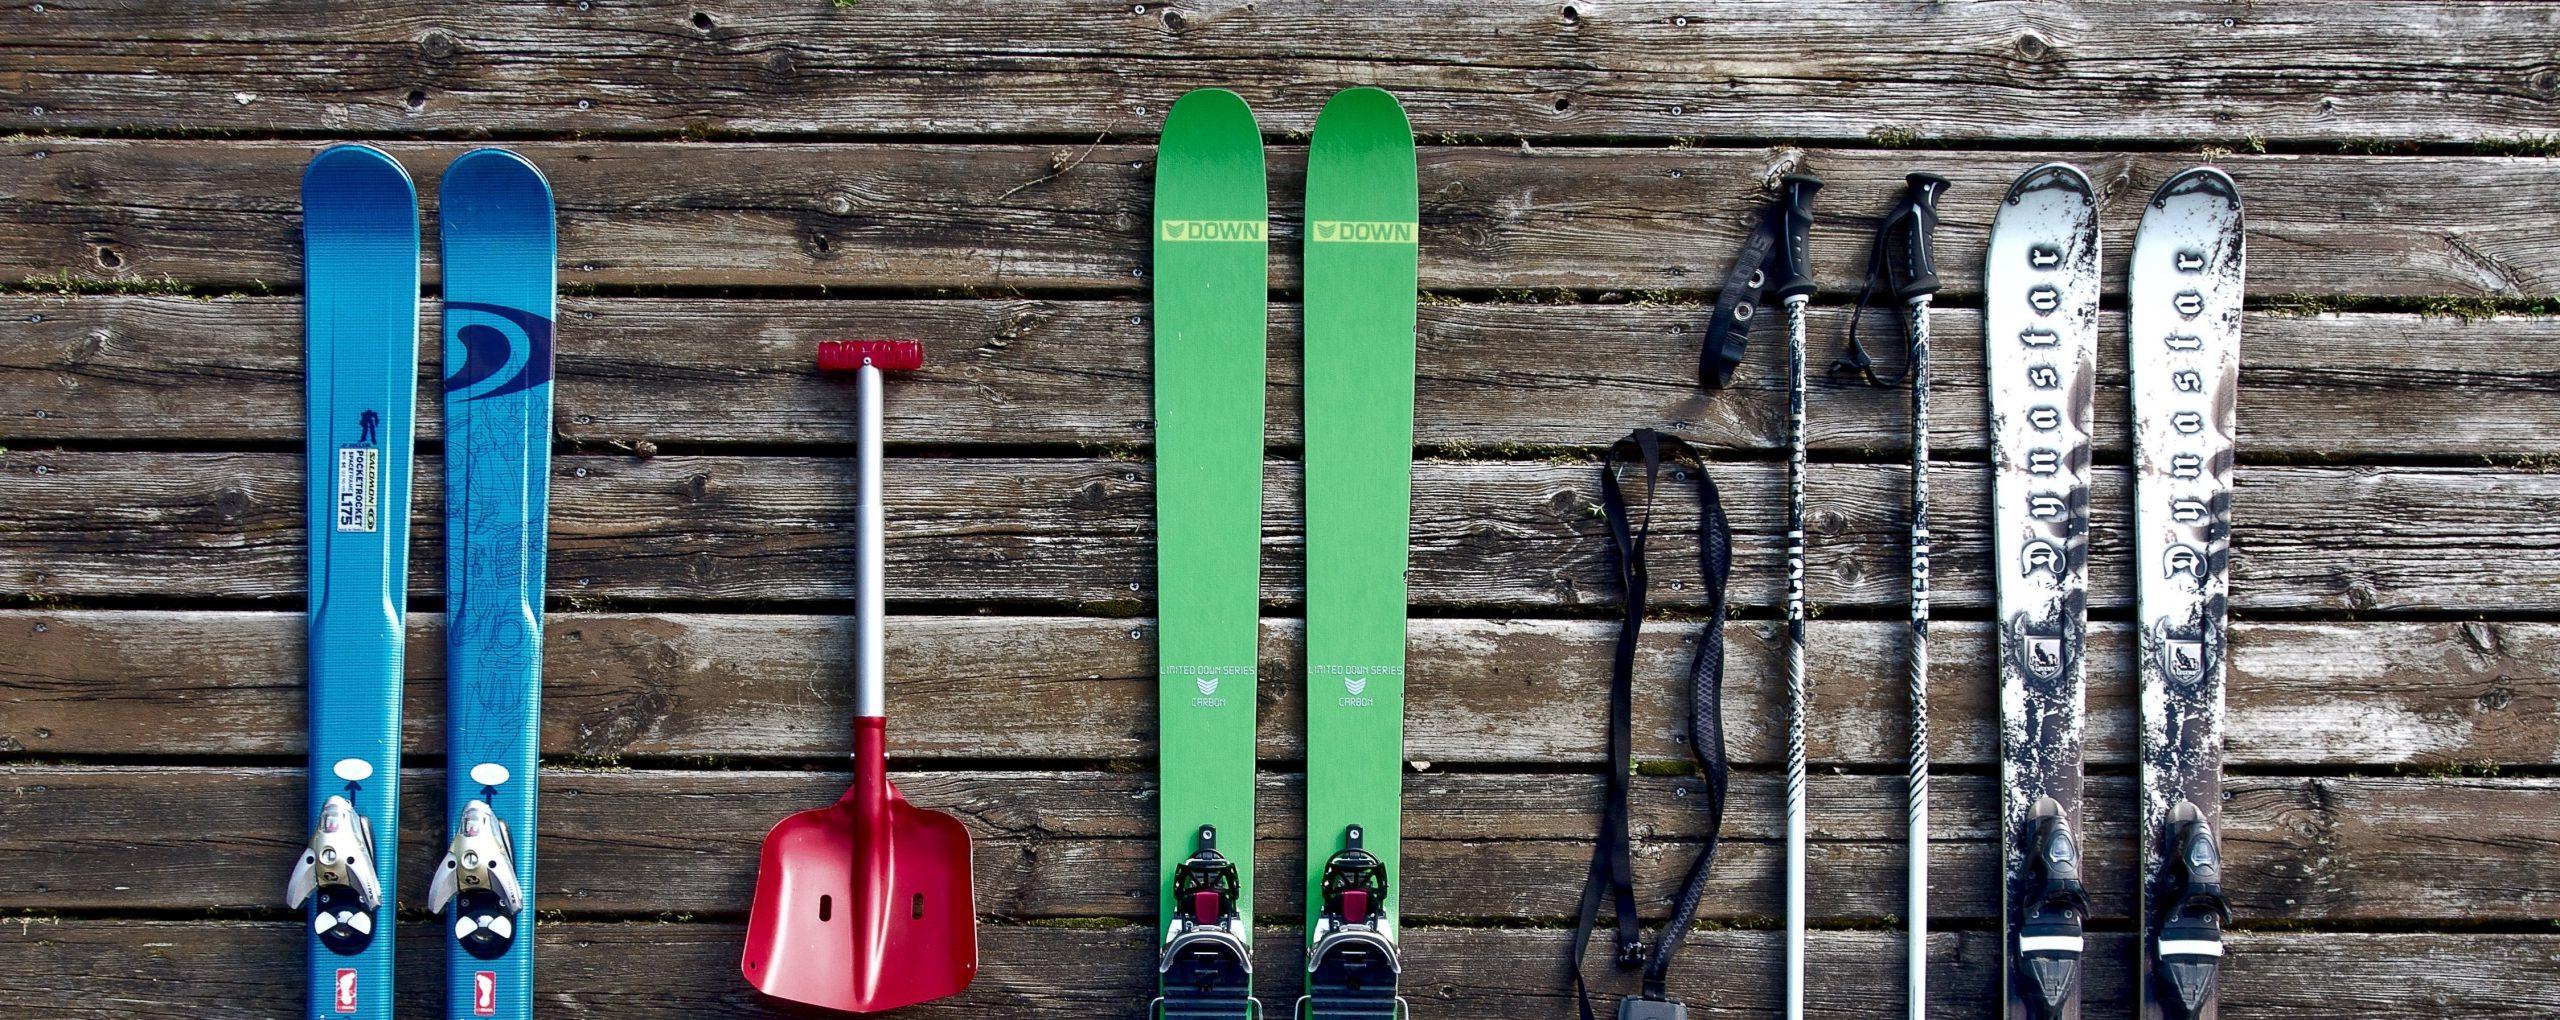 x-ski-932188